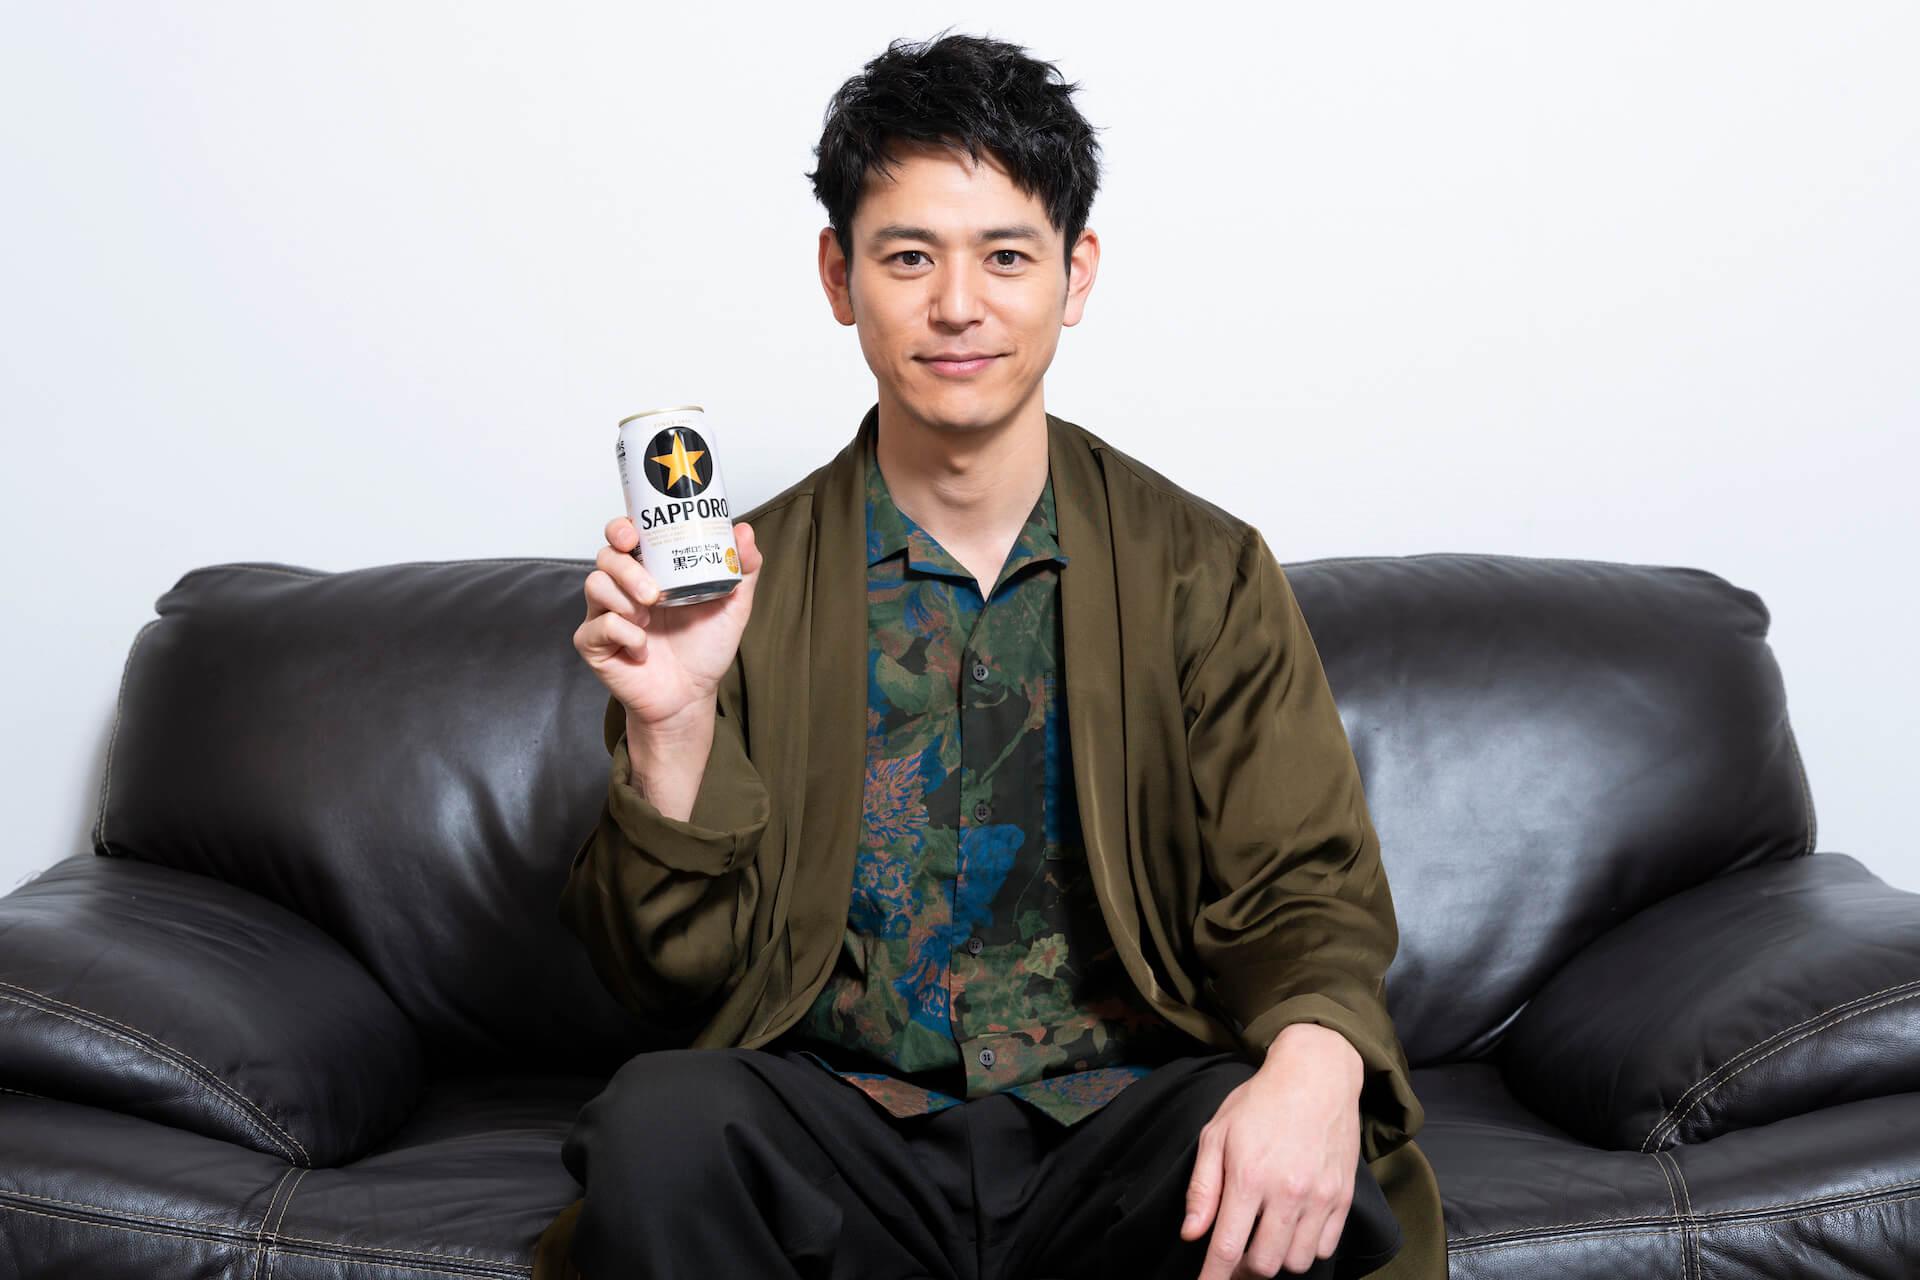 King Gnu常田大希が音楽について語るサッポロビールのCM新バージョンが放映決定!ホームページで特別メッセージムービーも公開 art200707_tsunetadaiki_beer_12